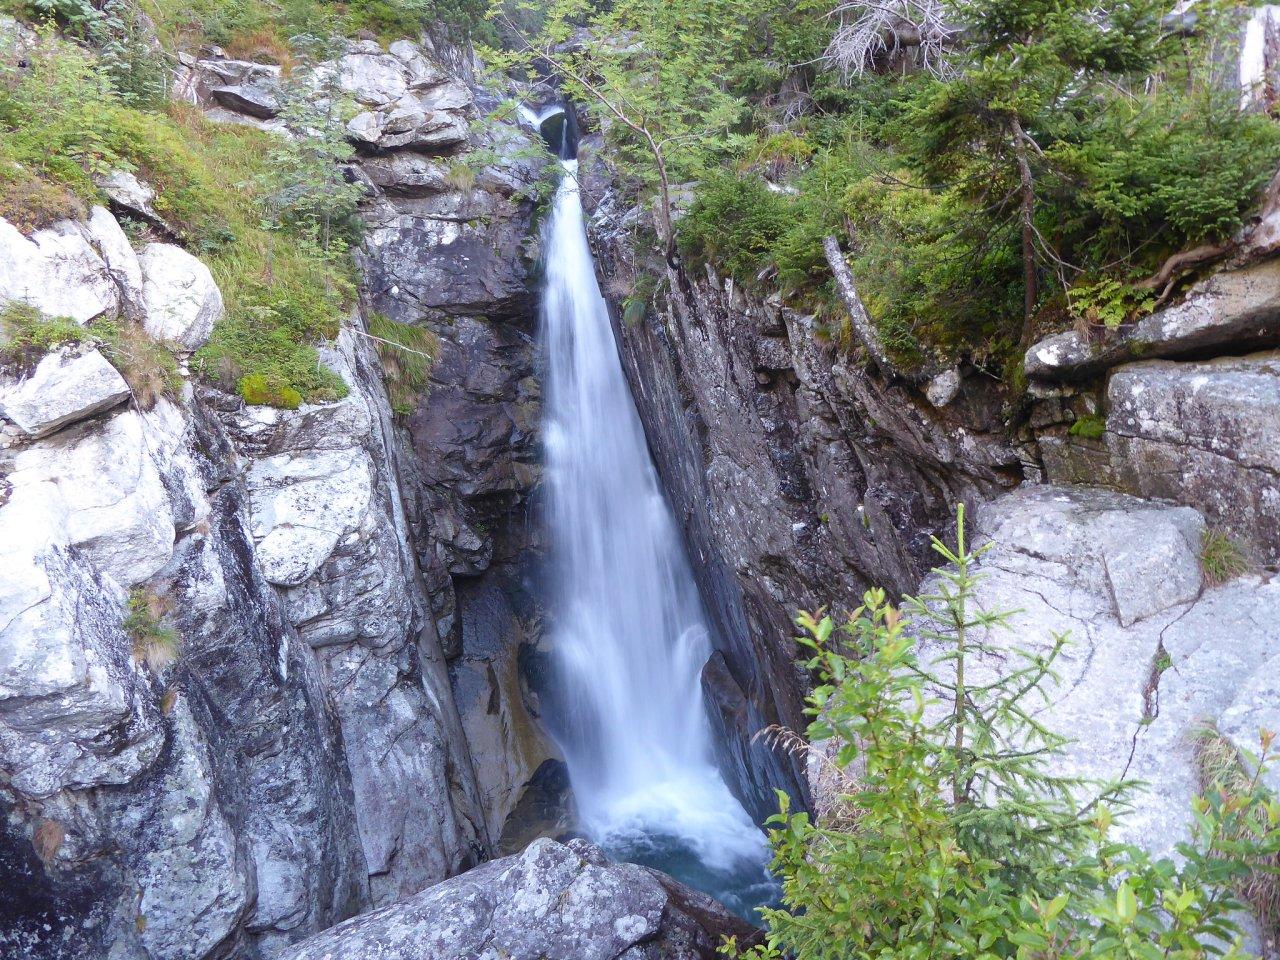 Obrovský vodopád, Vysoké Tatry, Slovensko